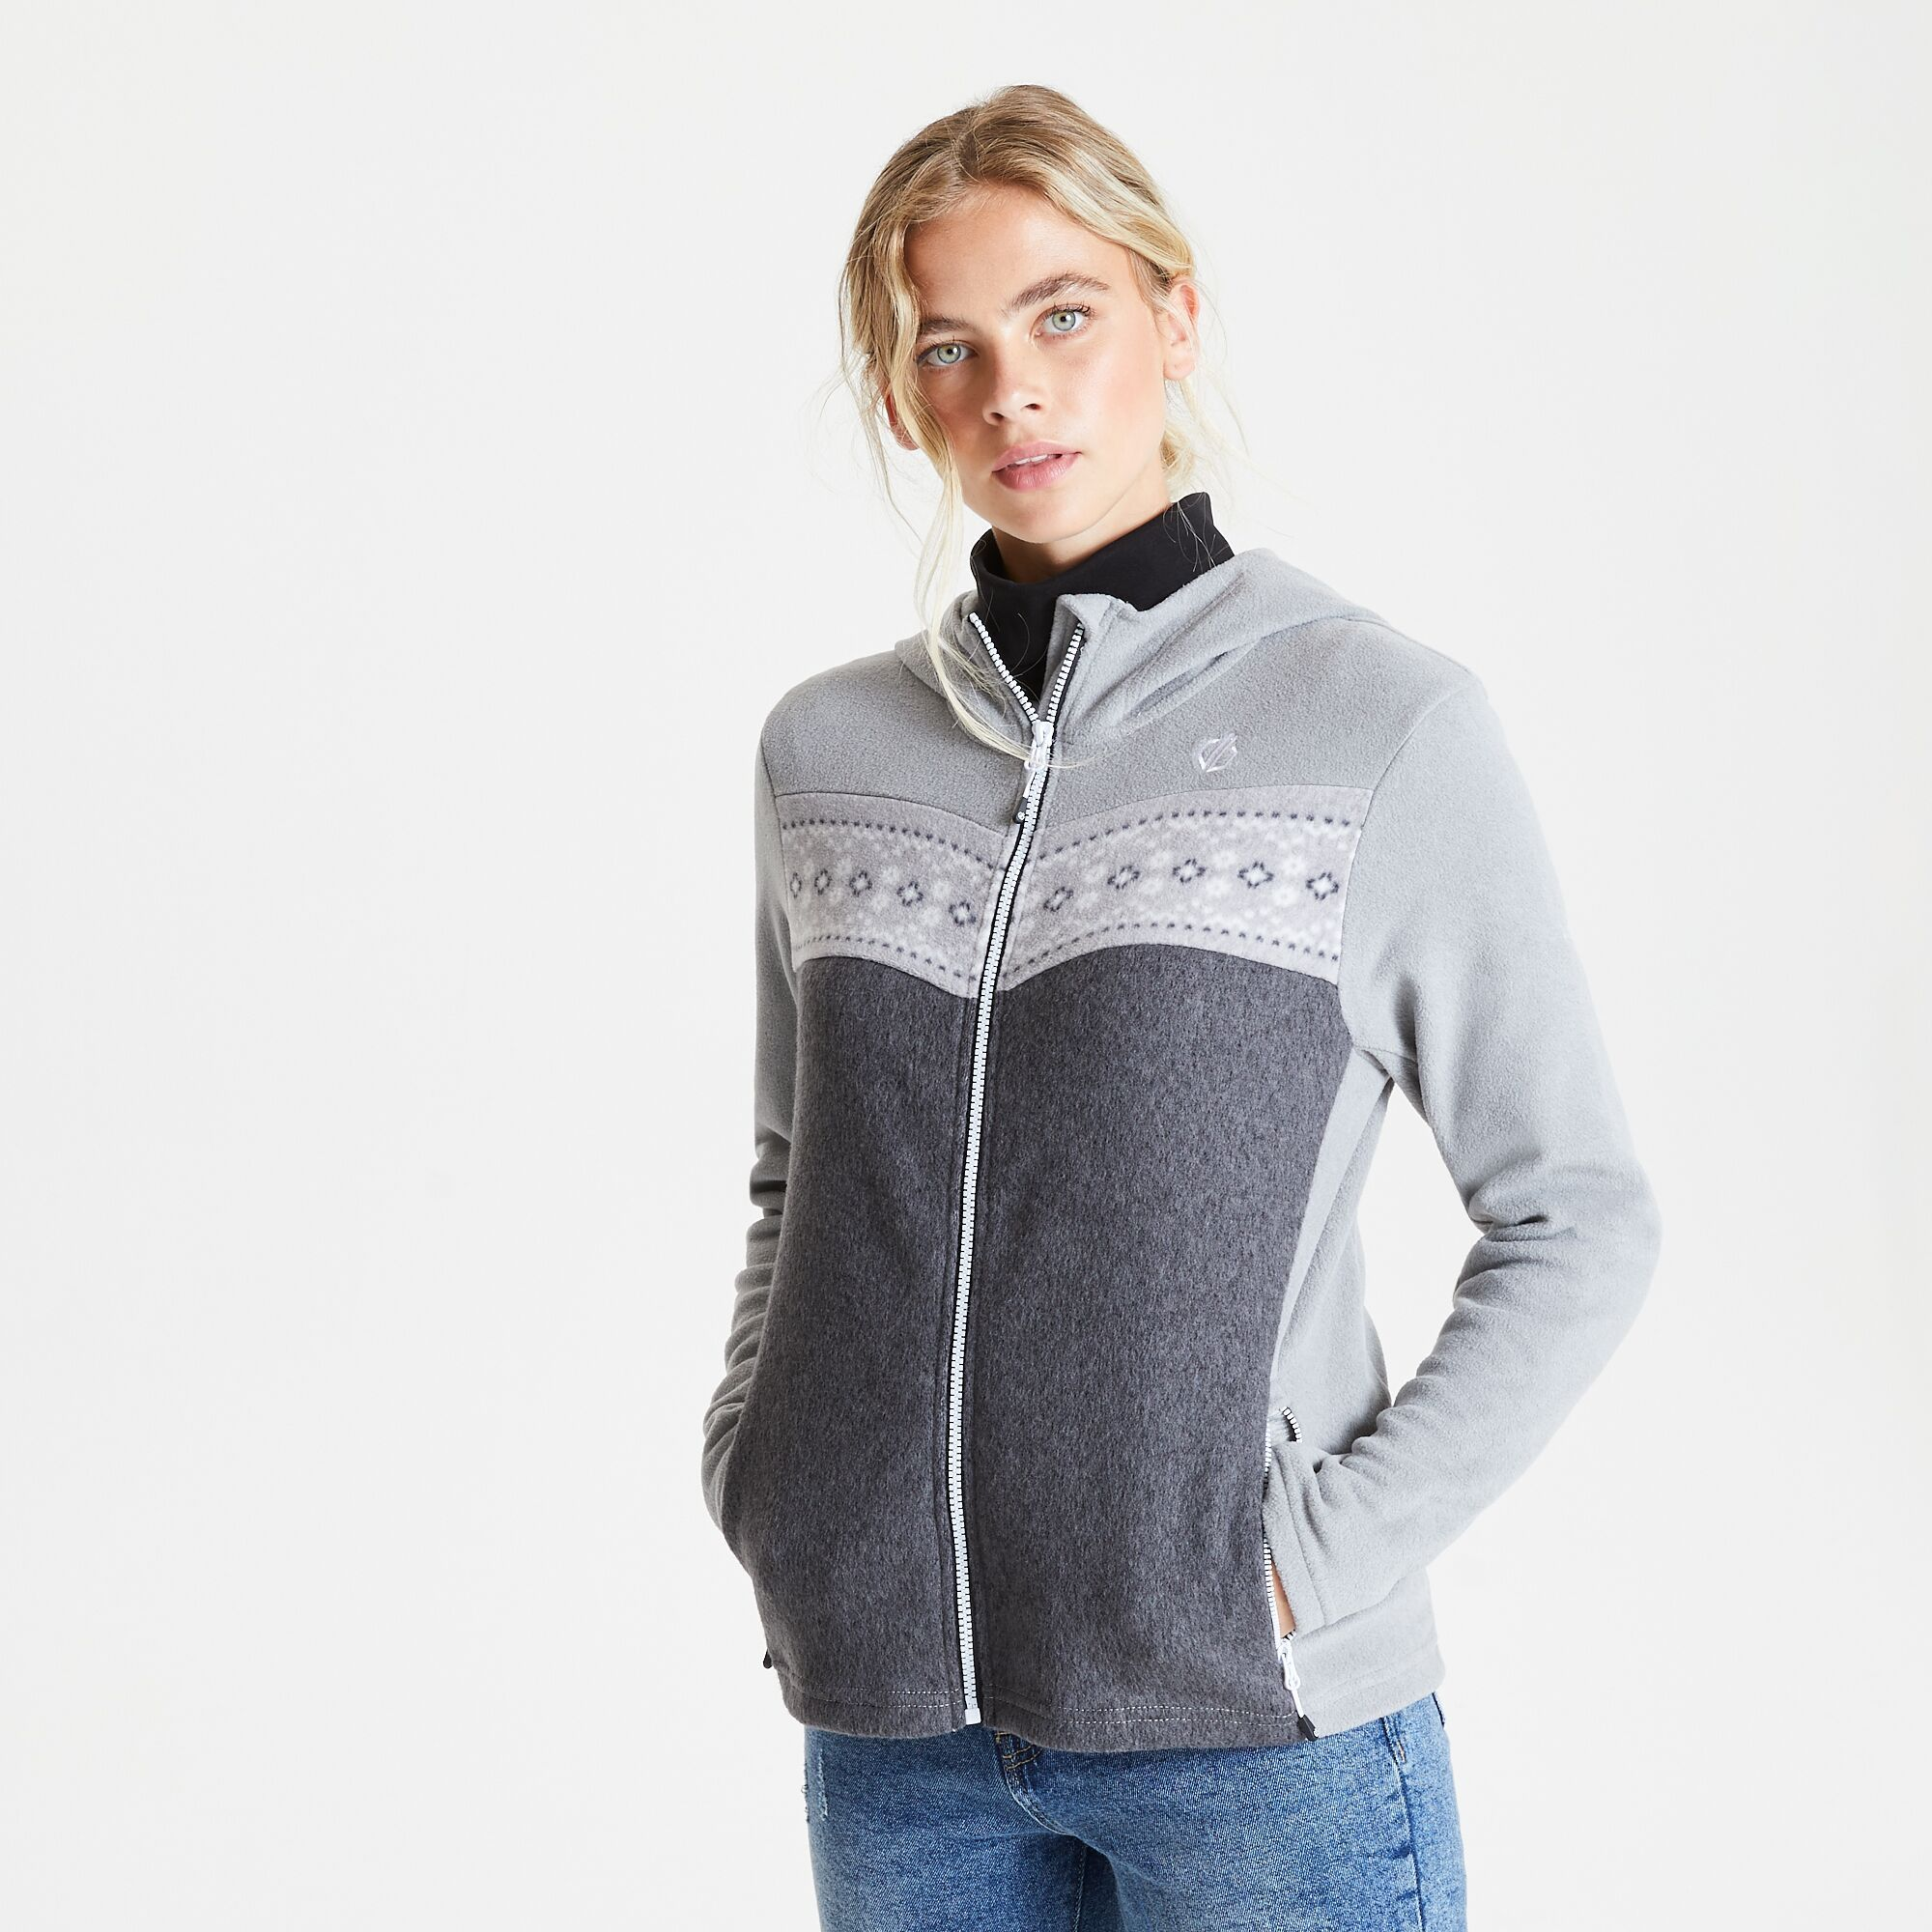 Dare 2b womens/ladies herald hooded fleece jacket (ash/charcoal grey)